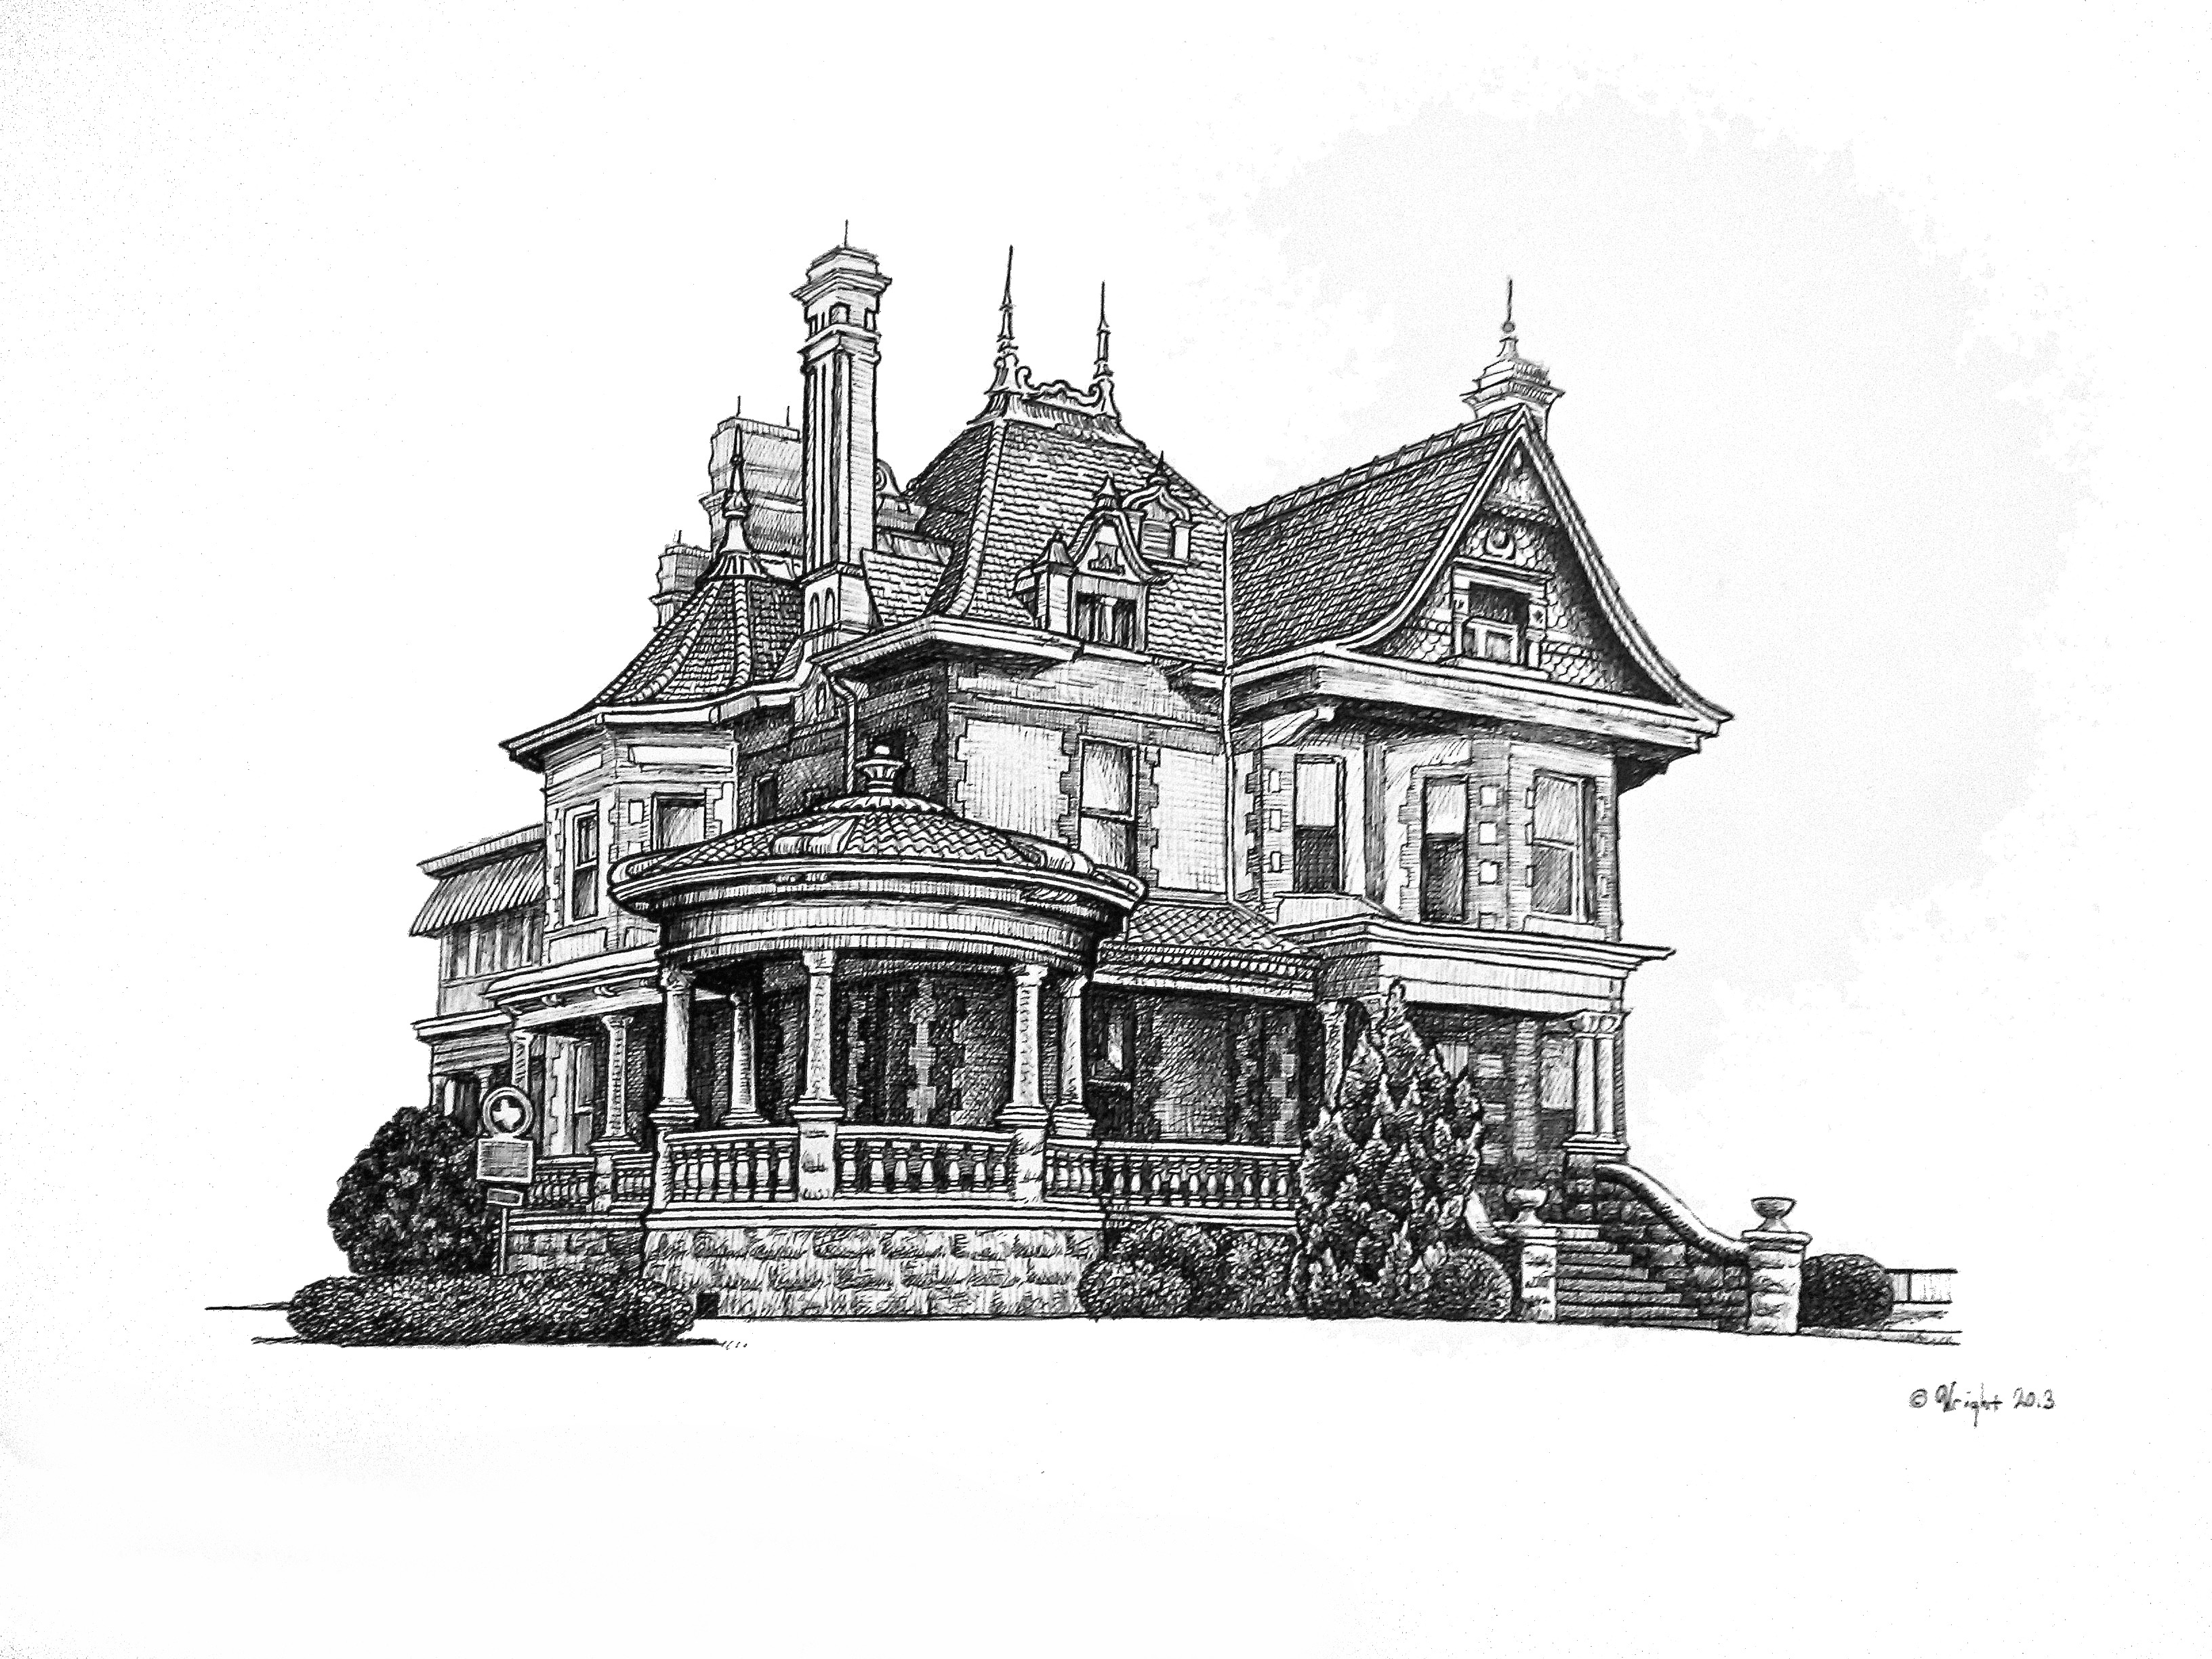 McFarland House by DeranWright